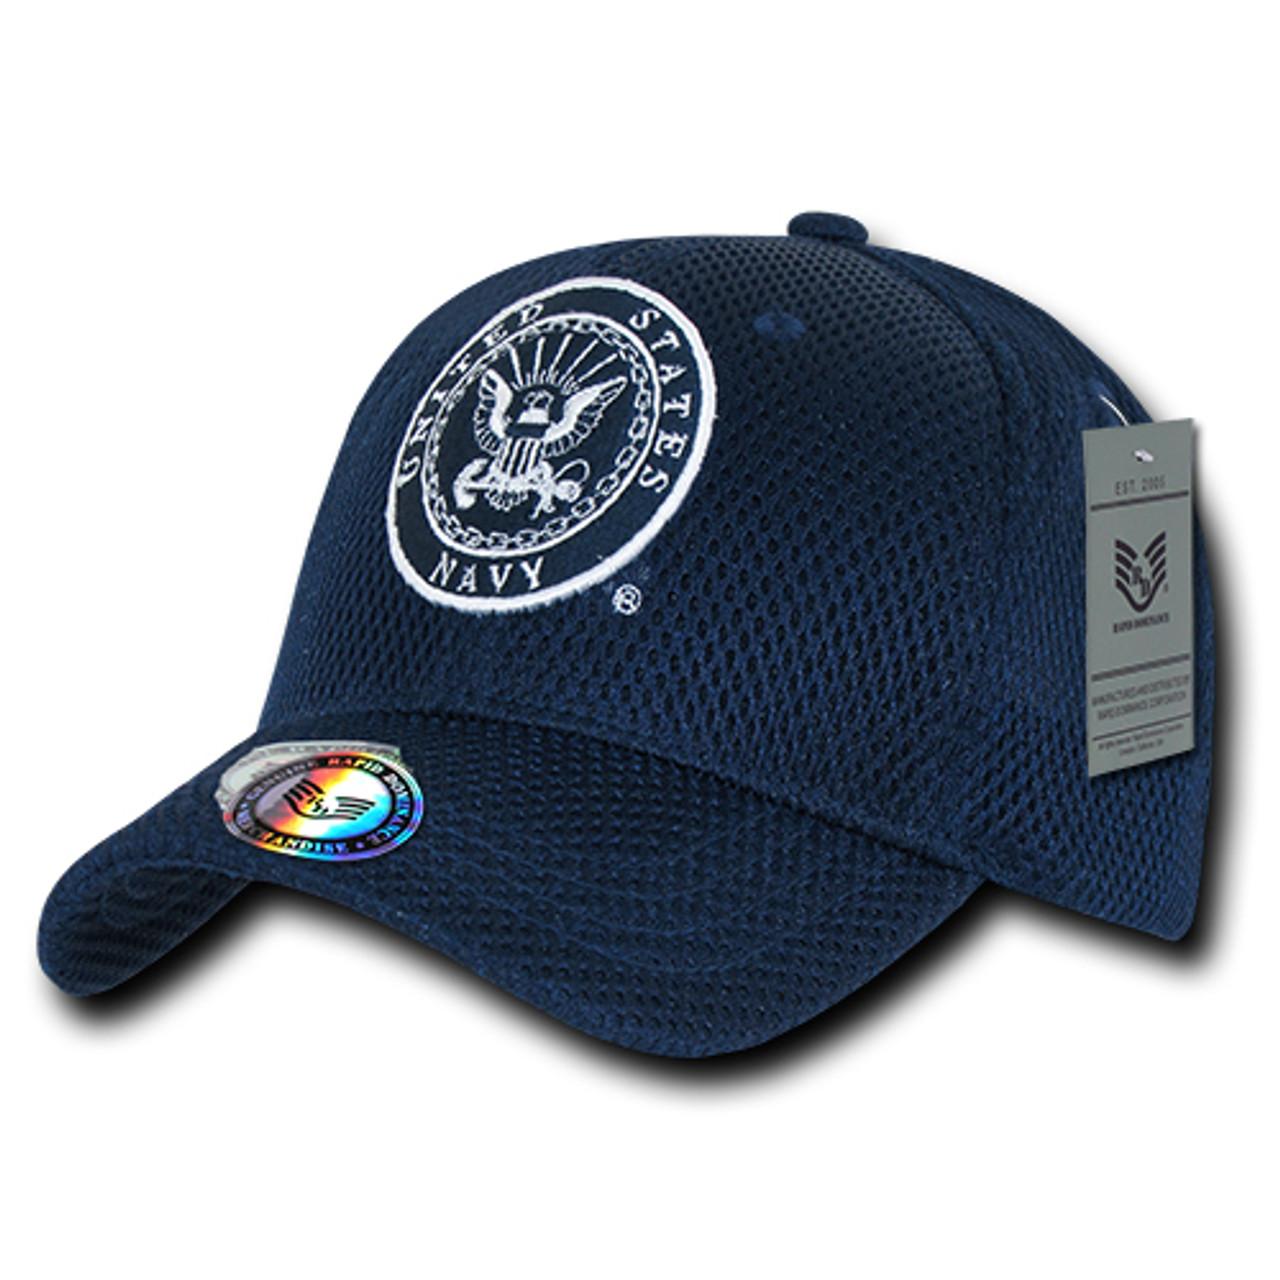 Navy United States Navy US NAVY Mesh OFFICIALLY LICENSED Baseball Cap Hat